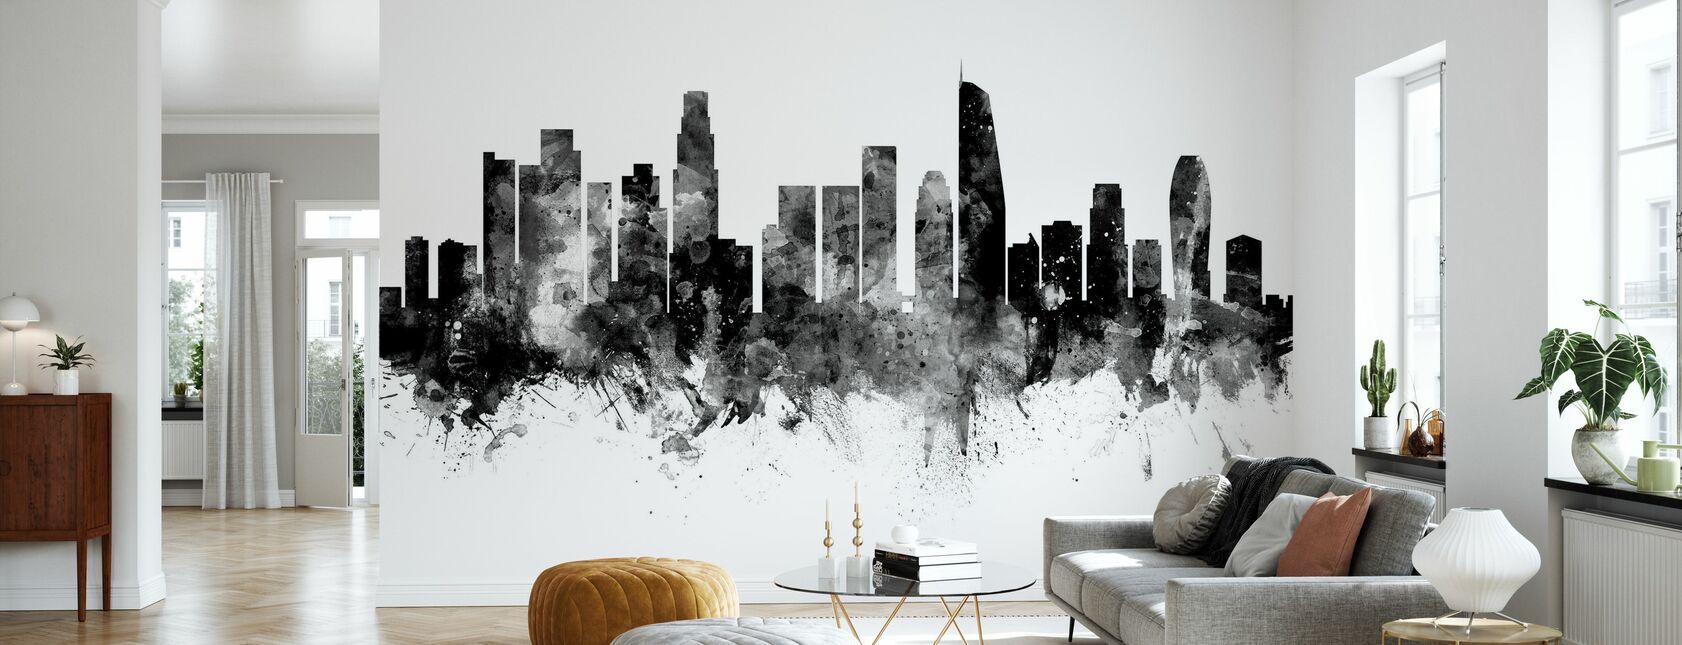 Los Angeles California Skyline, black and white 2 - Wallpaper - Living Room